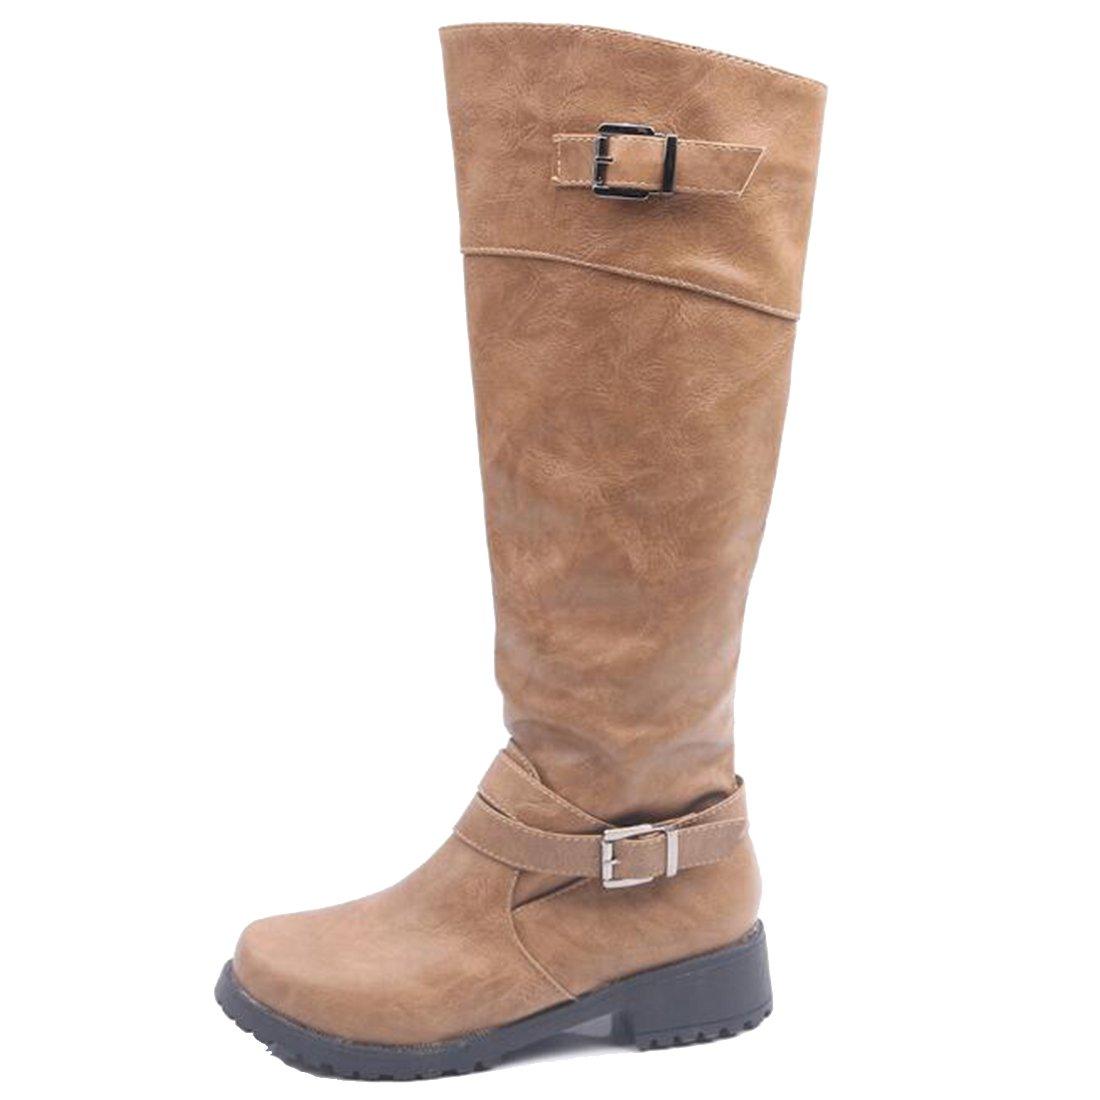 COVOYYAR Womens Double Buckle Knee High Mid Calf Riding Boots